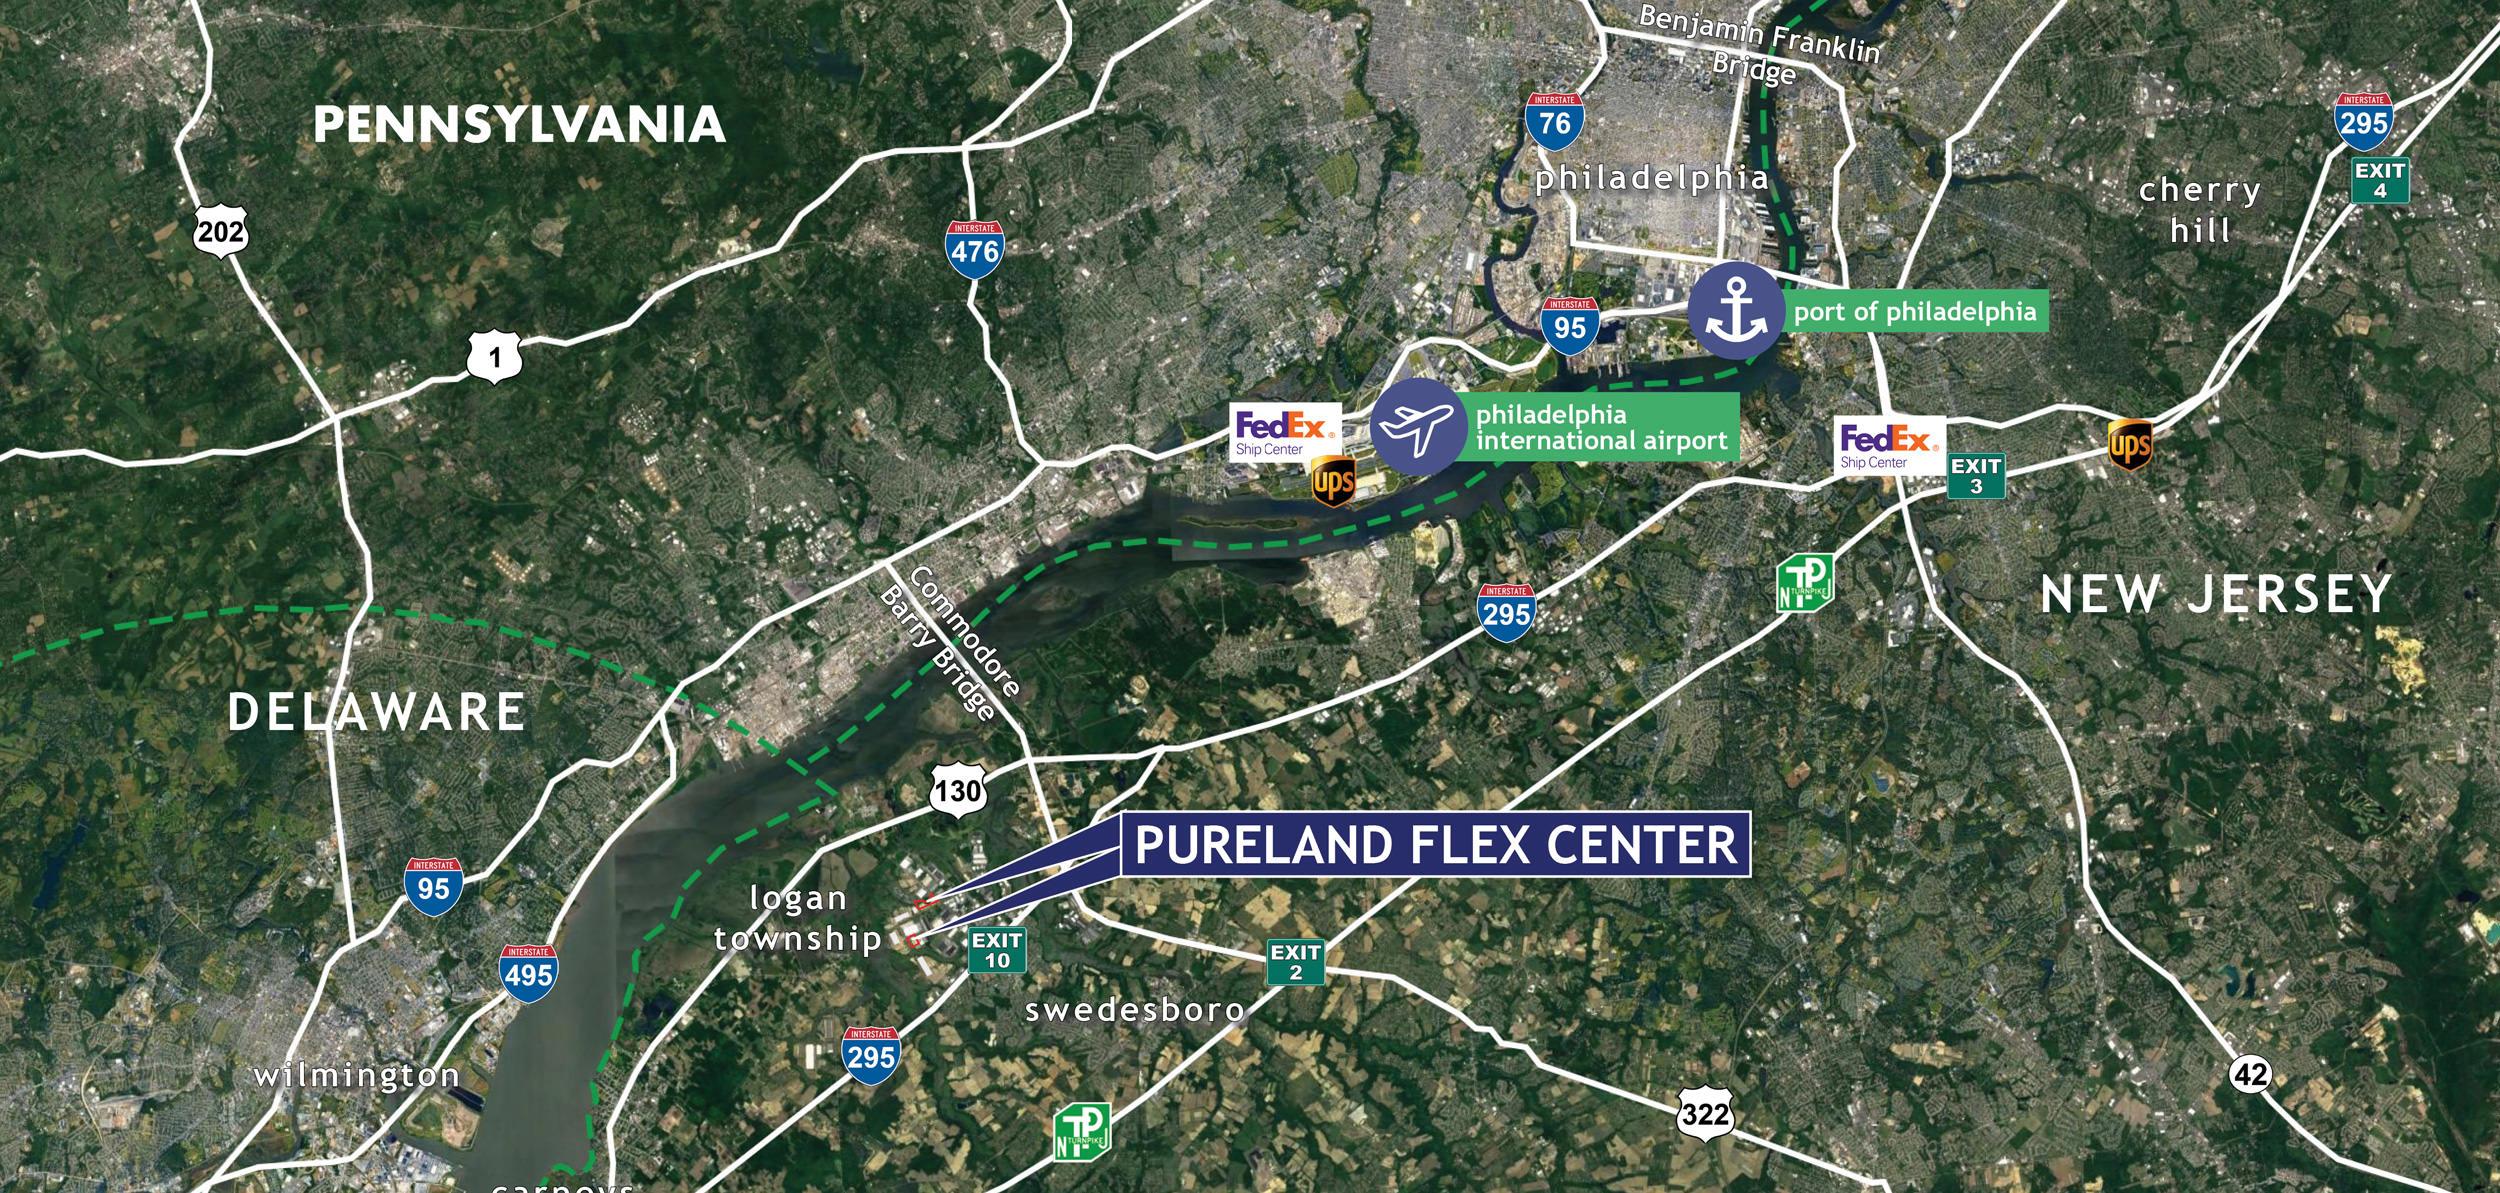 Pureland Flex Center - Locations Map